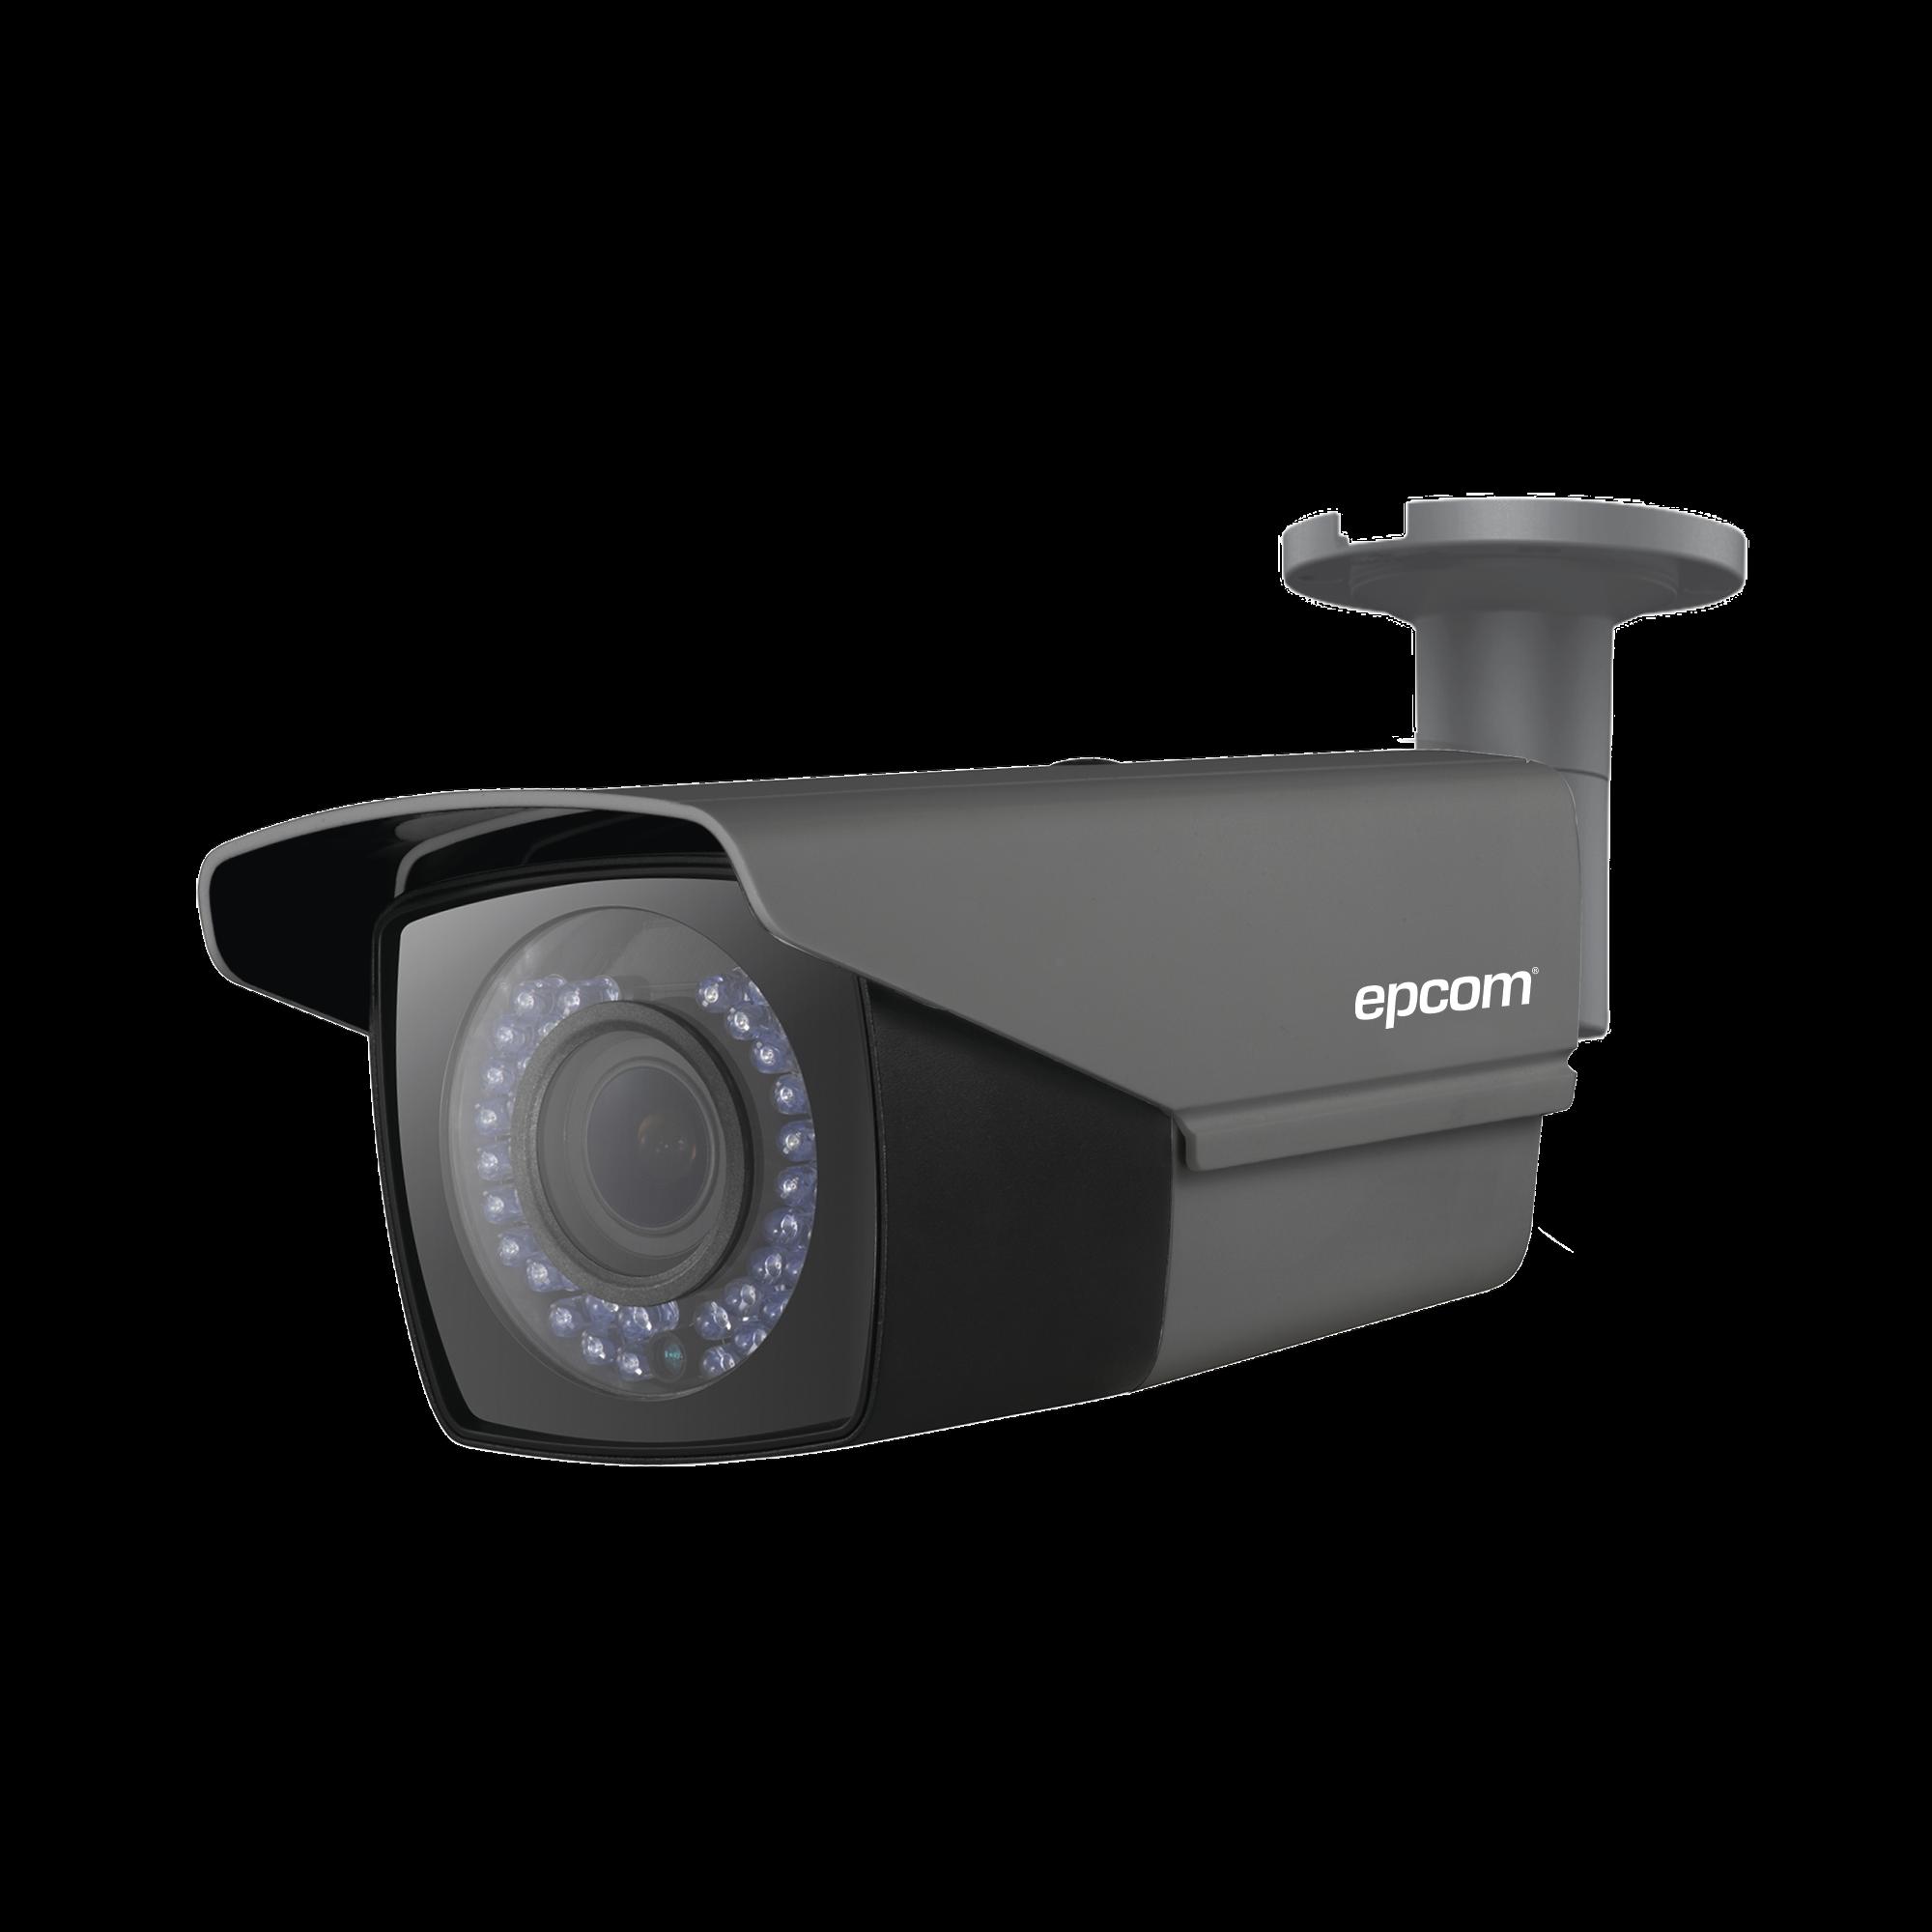 Bullet TURBOHD 720p / HÍBRIDA / CLIMAS EXTREMOS /  Lente Varifocal 2.8 a 12 mm / IR Inteligente 40 mts / Exterior IP66